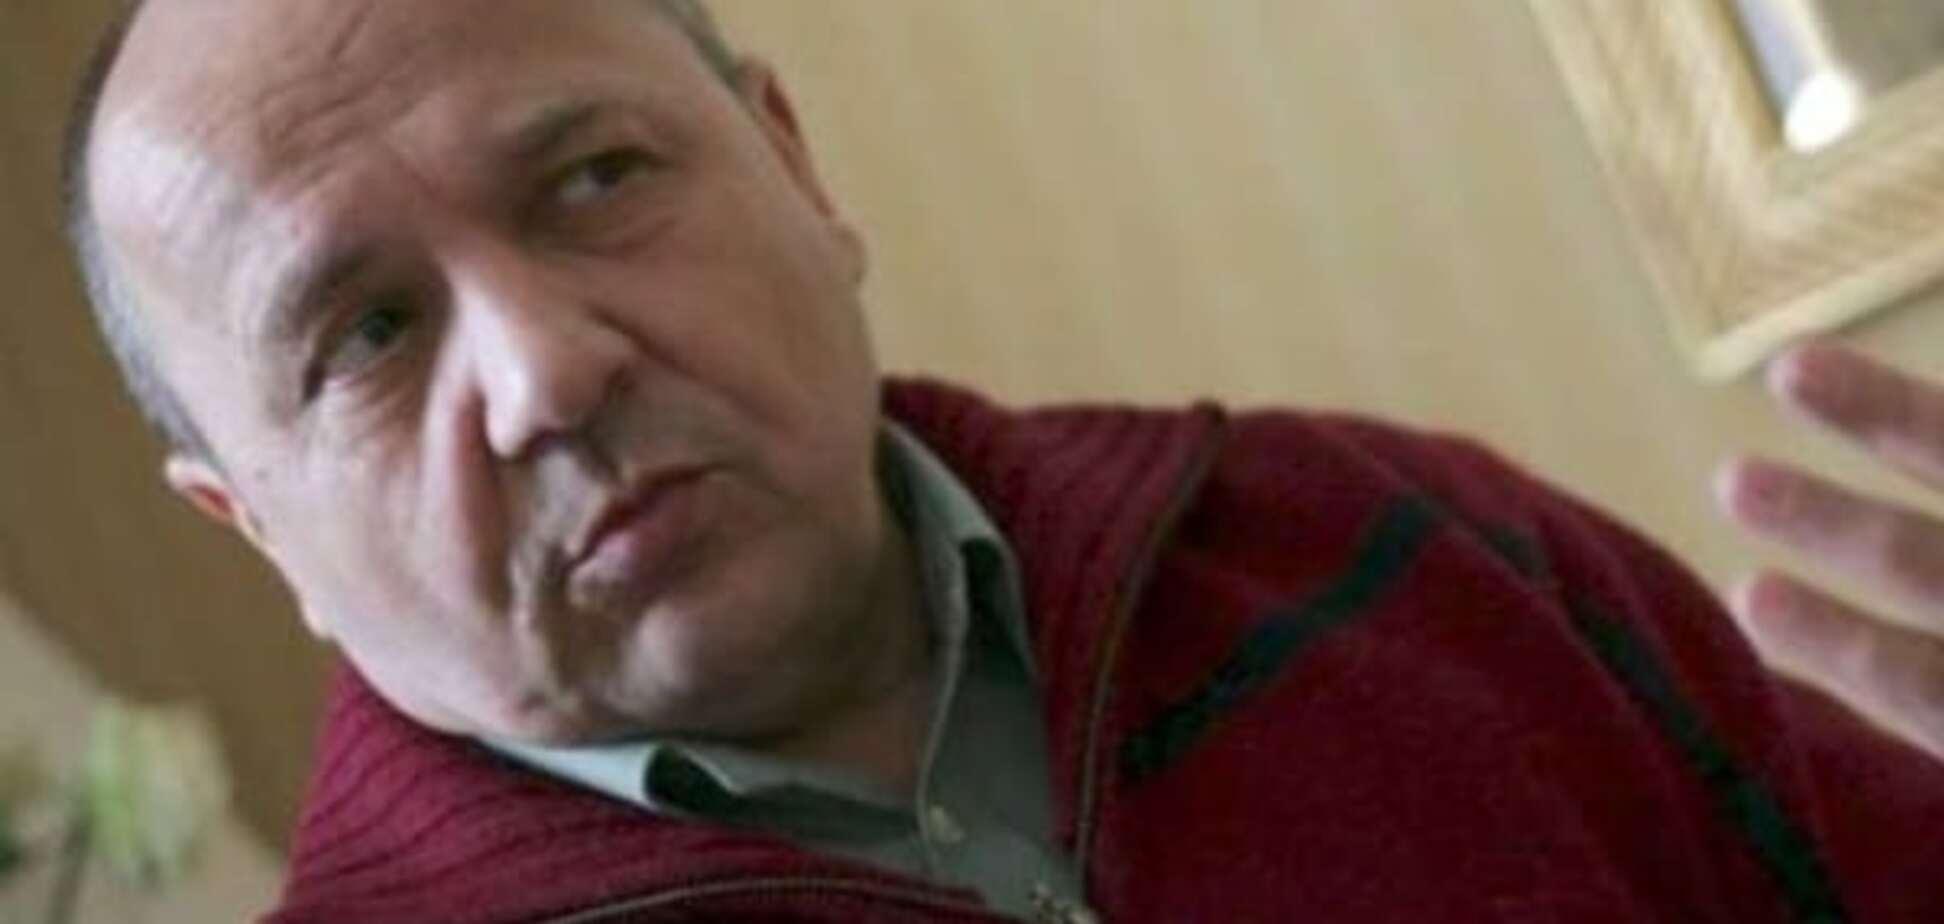 Ляпас Кремлю: Порошенка просять дати звання Героя України письменнику Суворову